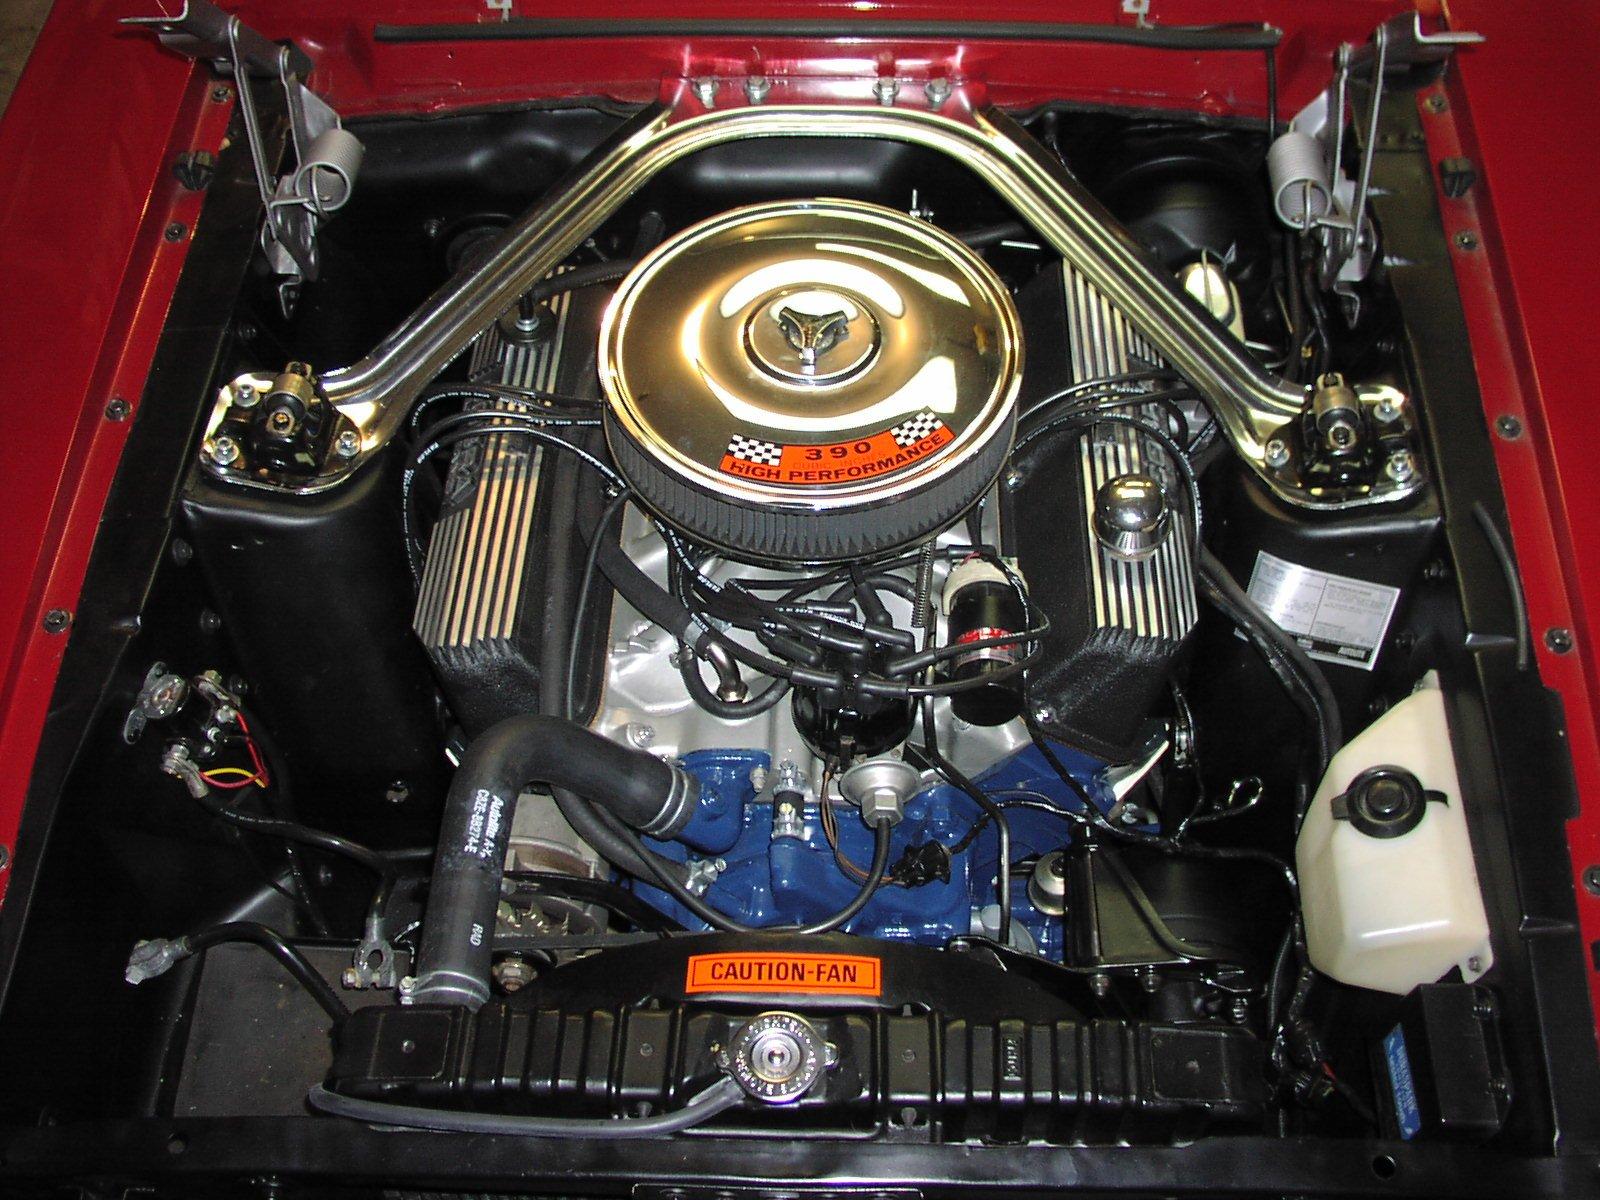 390 Ford Duraspark Wiring - wiring diagrams